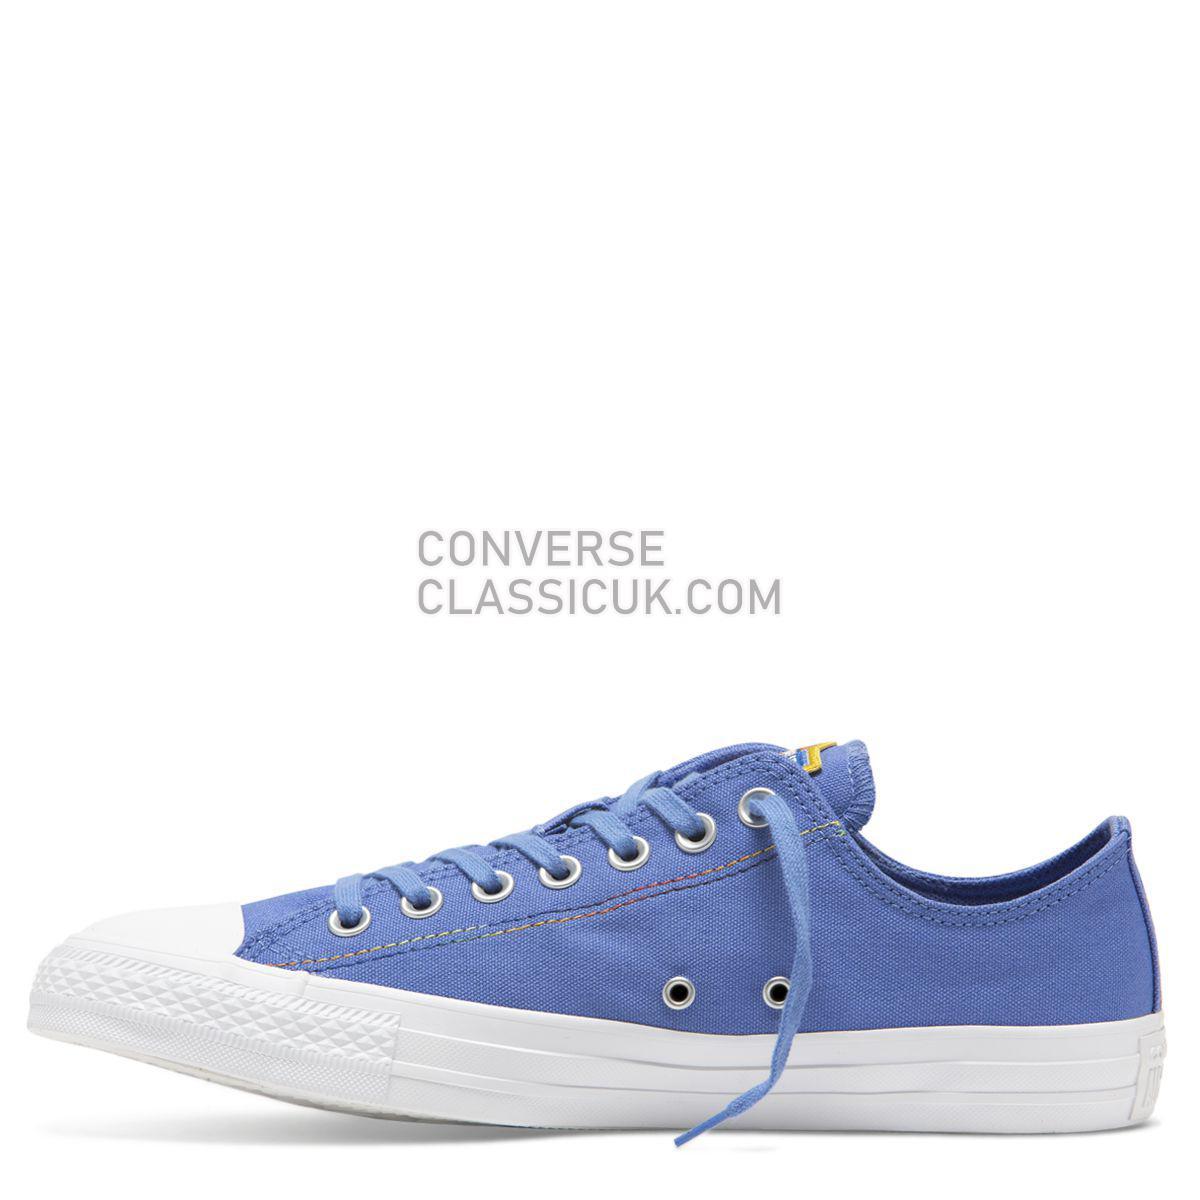 Converse Chuck Taylor All Star Rainbow Low Top Ozone Blue Mens Womens Unisex 165427 Ozone Blue/White/Vivid Sulfur Shoes